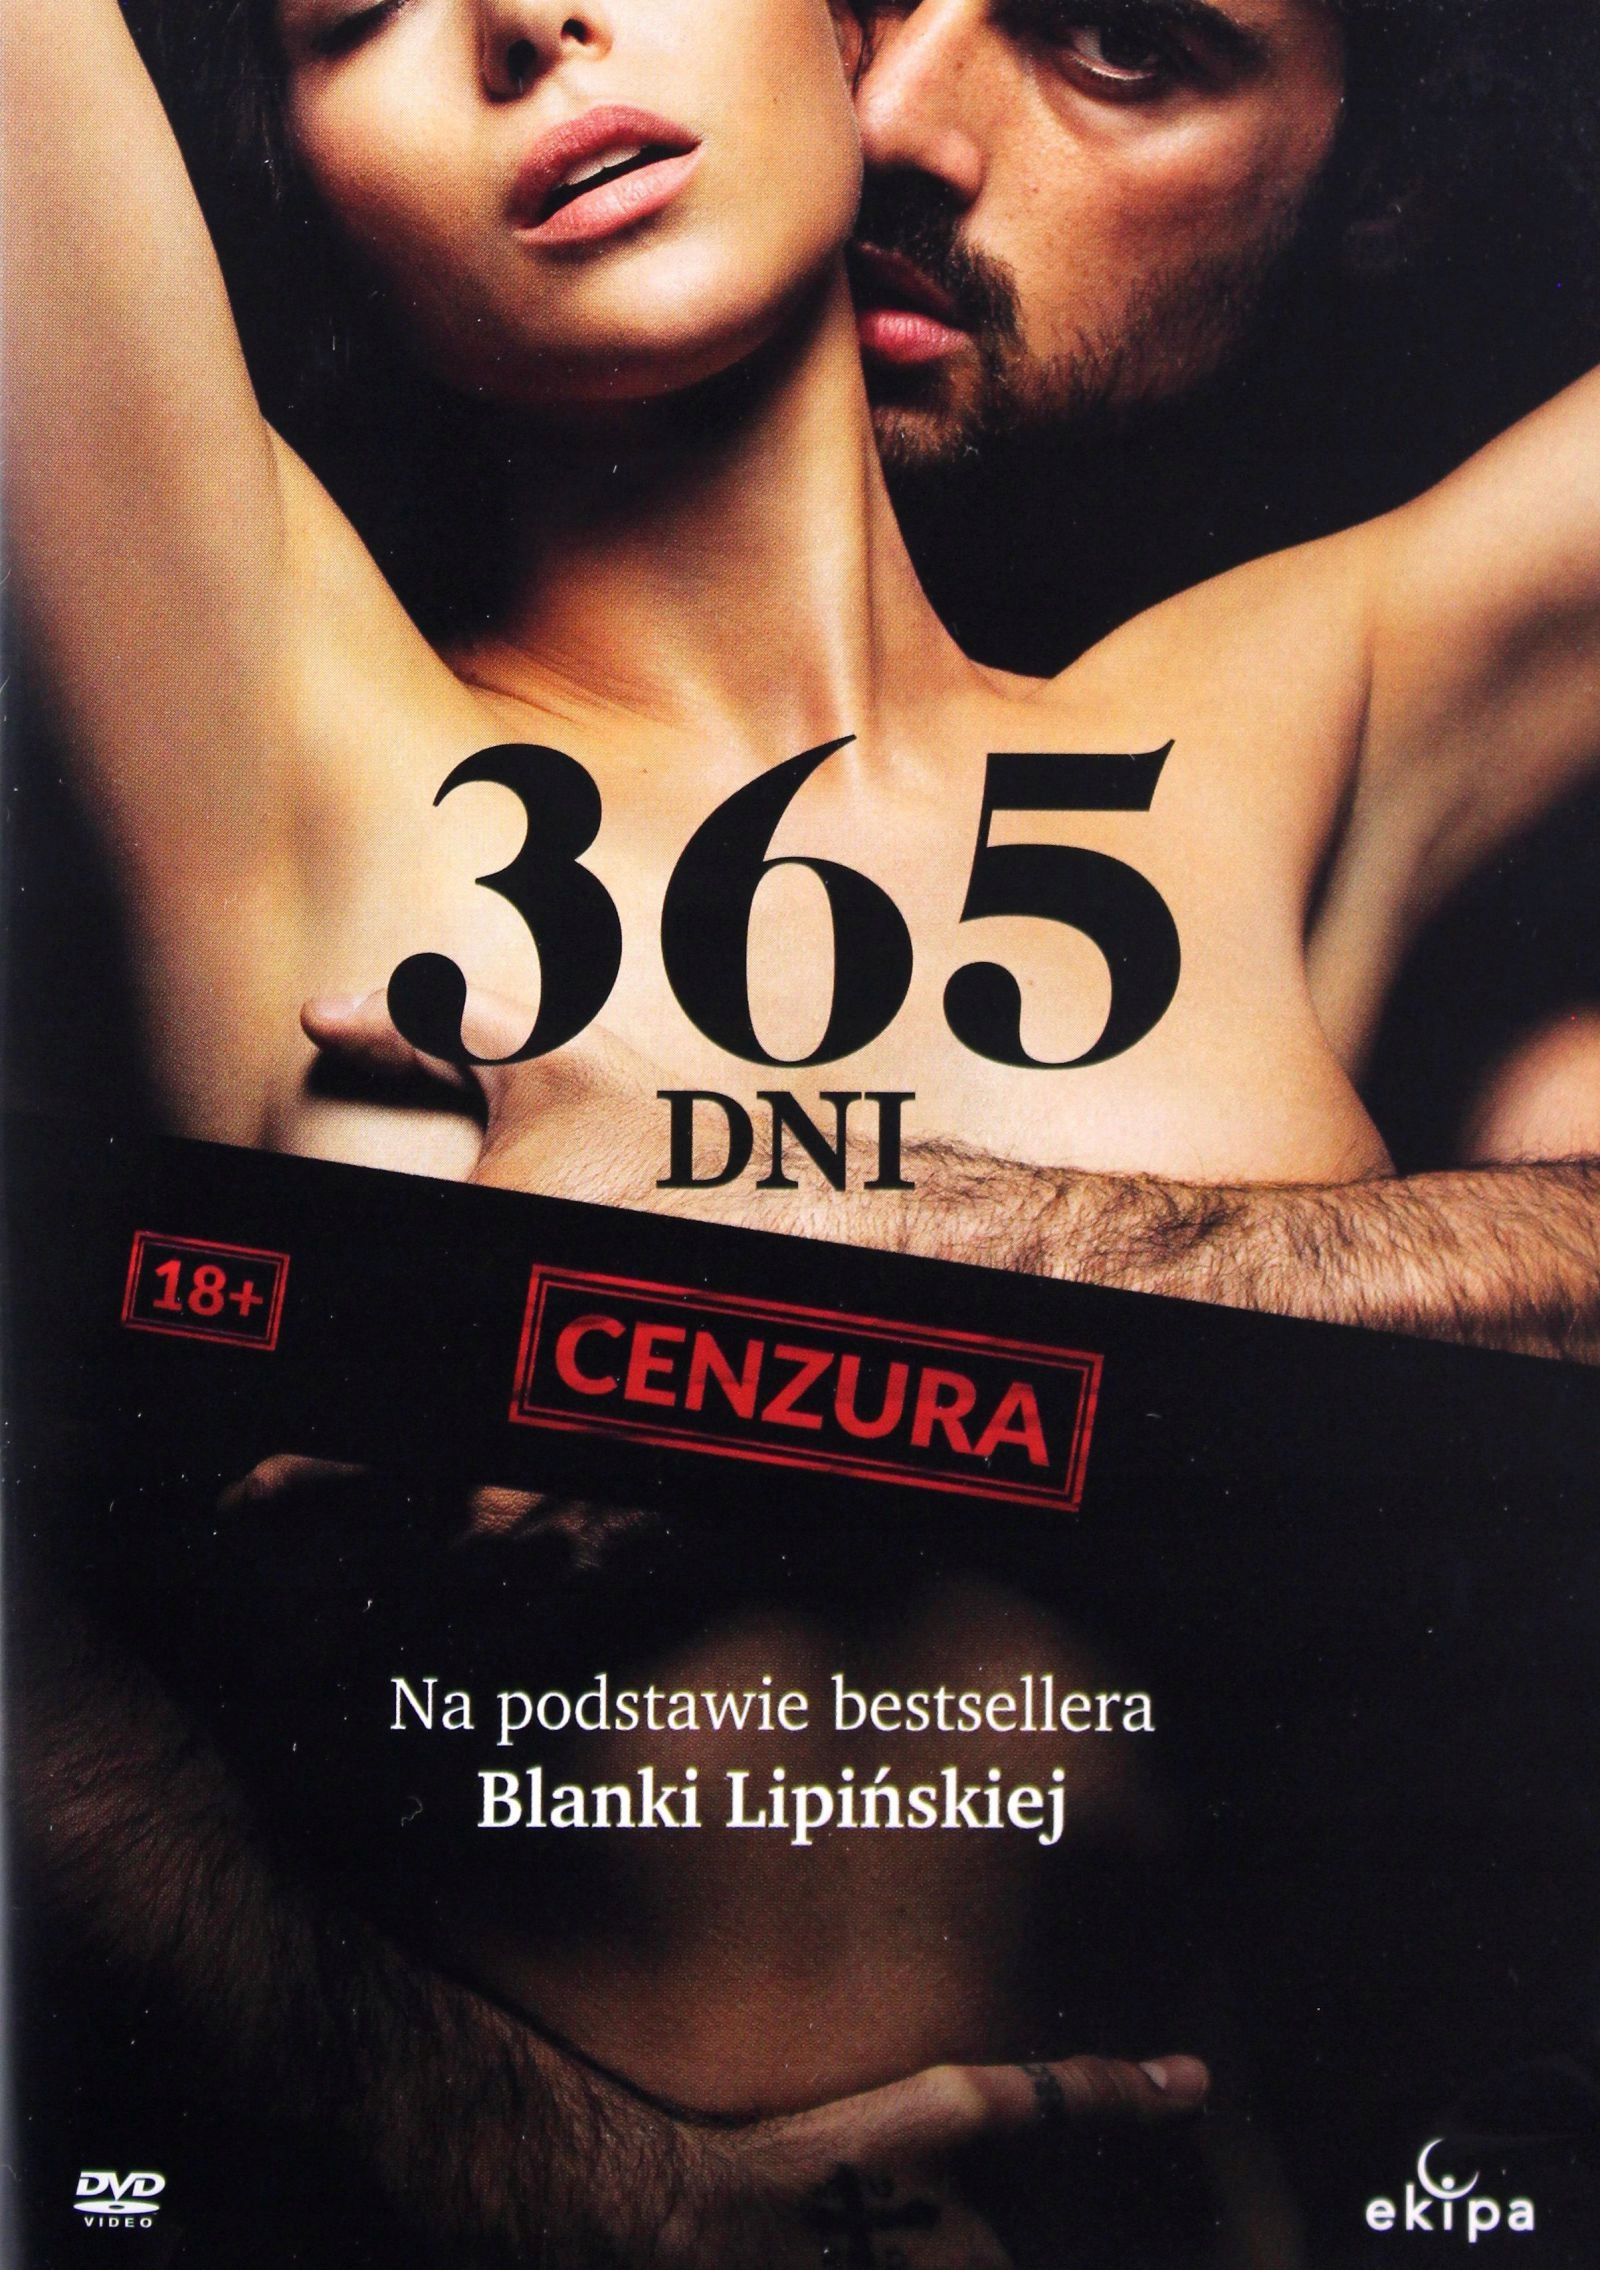 Item 365 DAYS [DVD] [BLANKA LIPIŃSKA] NEW